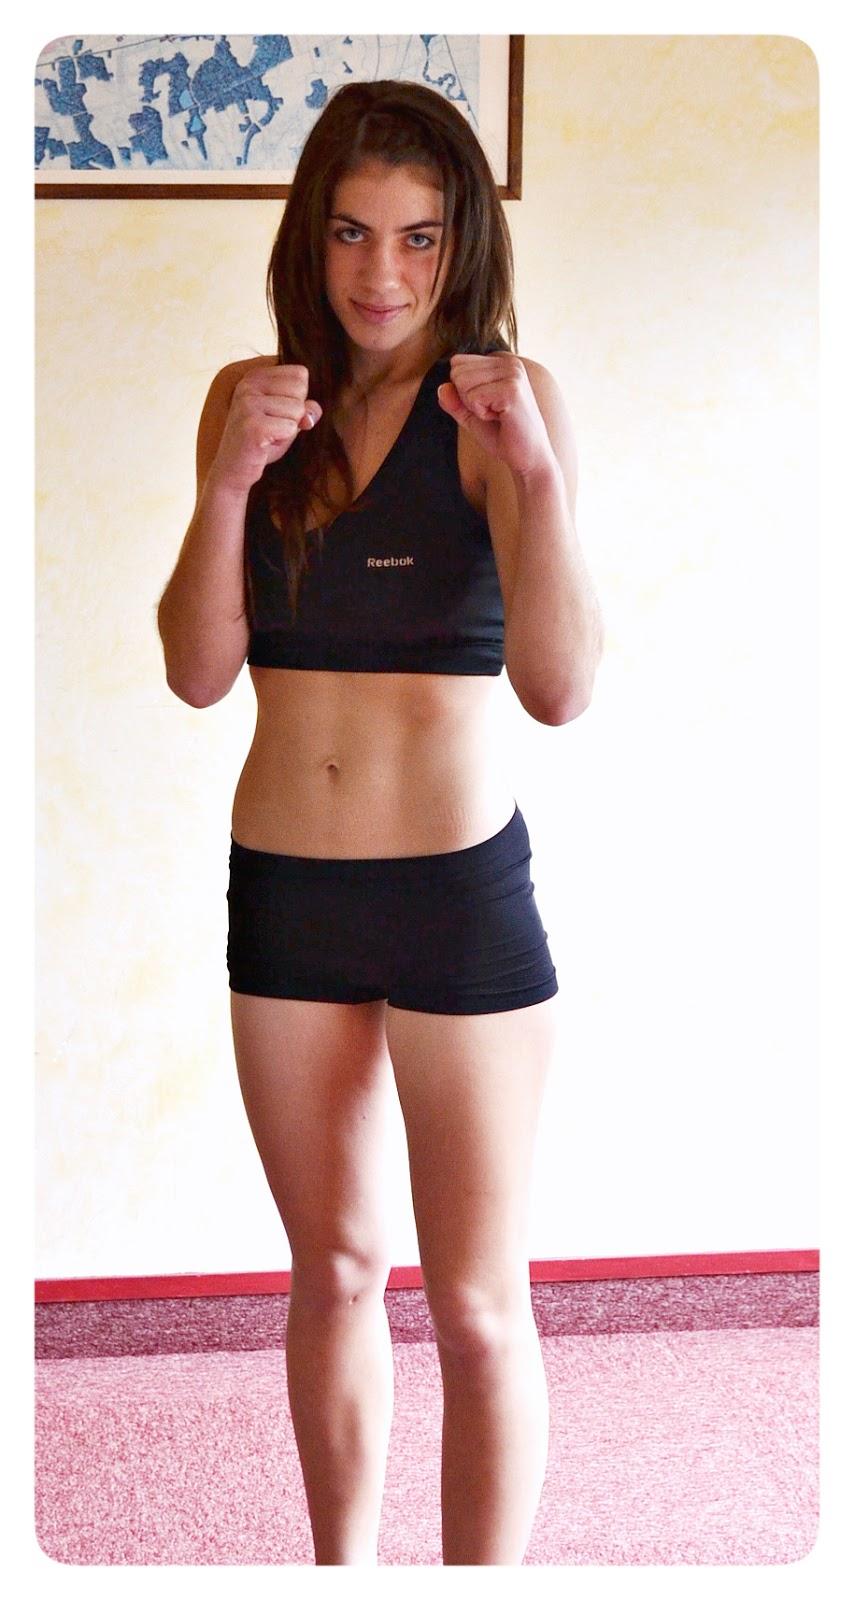 Karolina Gleisner,  boks, kickboxing, treningi, Zielona Góra, muay thai, SKF Boksing Zielona Góra, sport